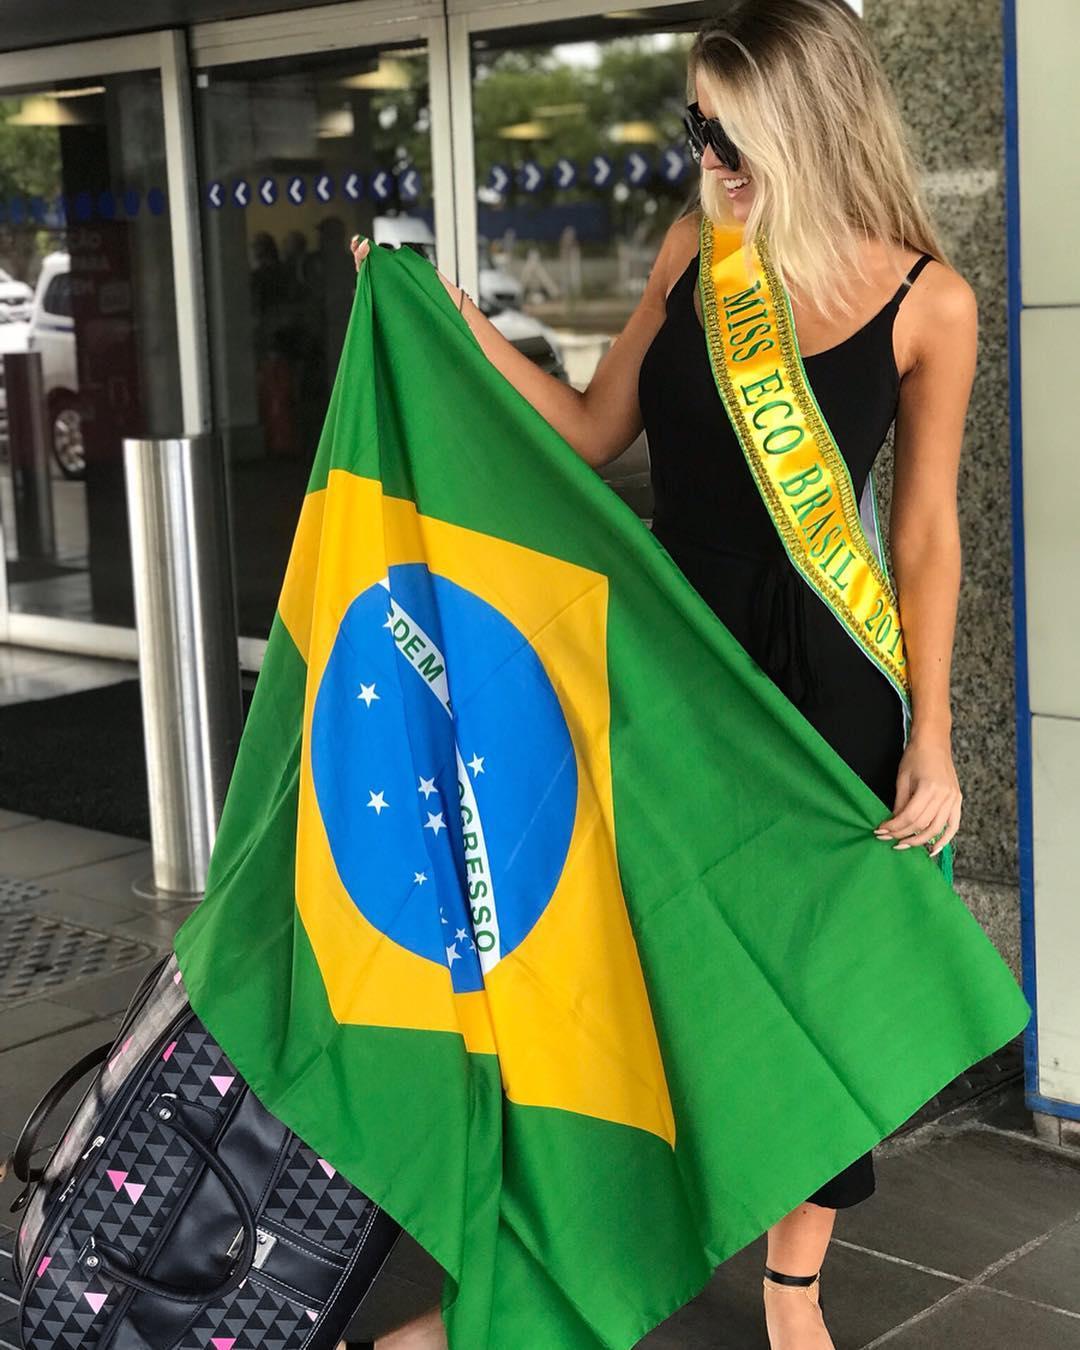 taina laydner, miss eco brasil 2019. - Página 3 52793410